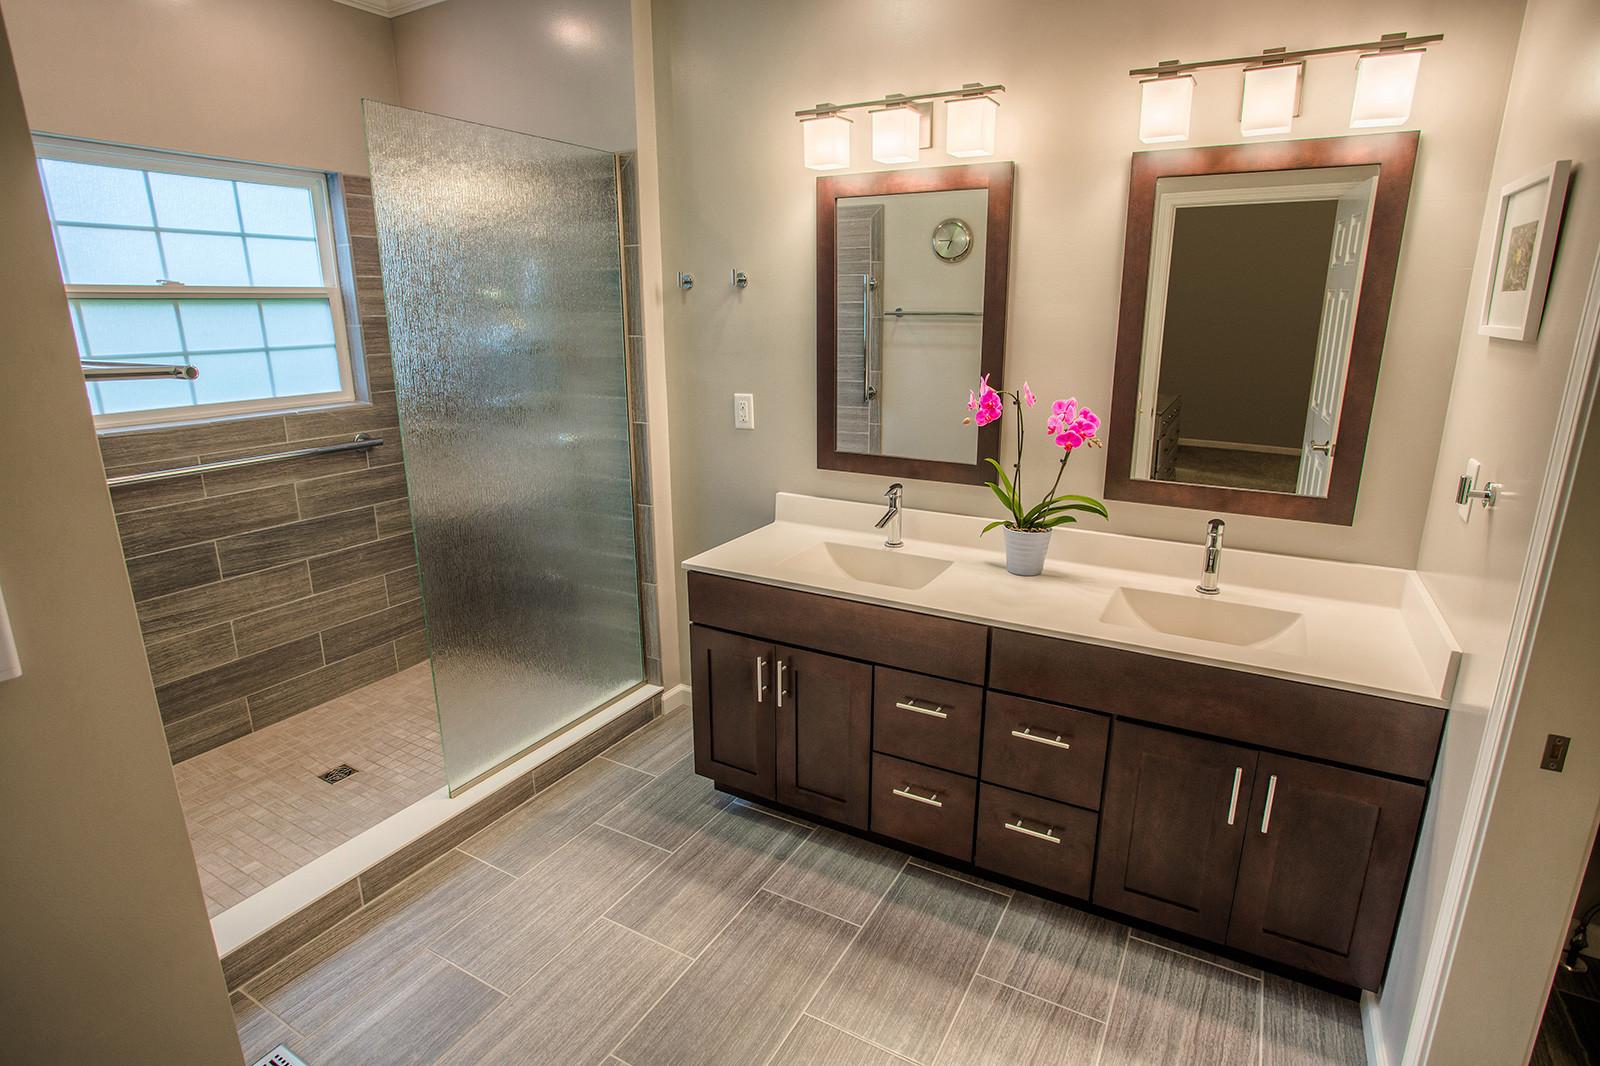 Remodeling Master Bathroom Ideas Luxury West Lafayette Contemporary Master Bathroom Remodel